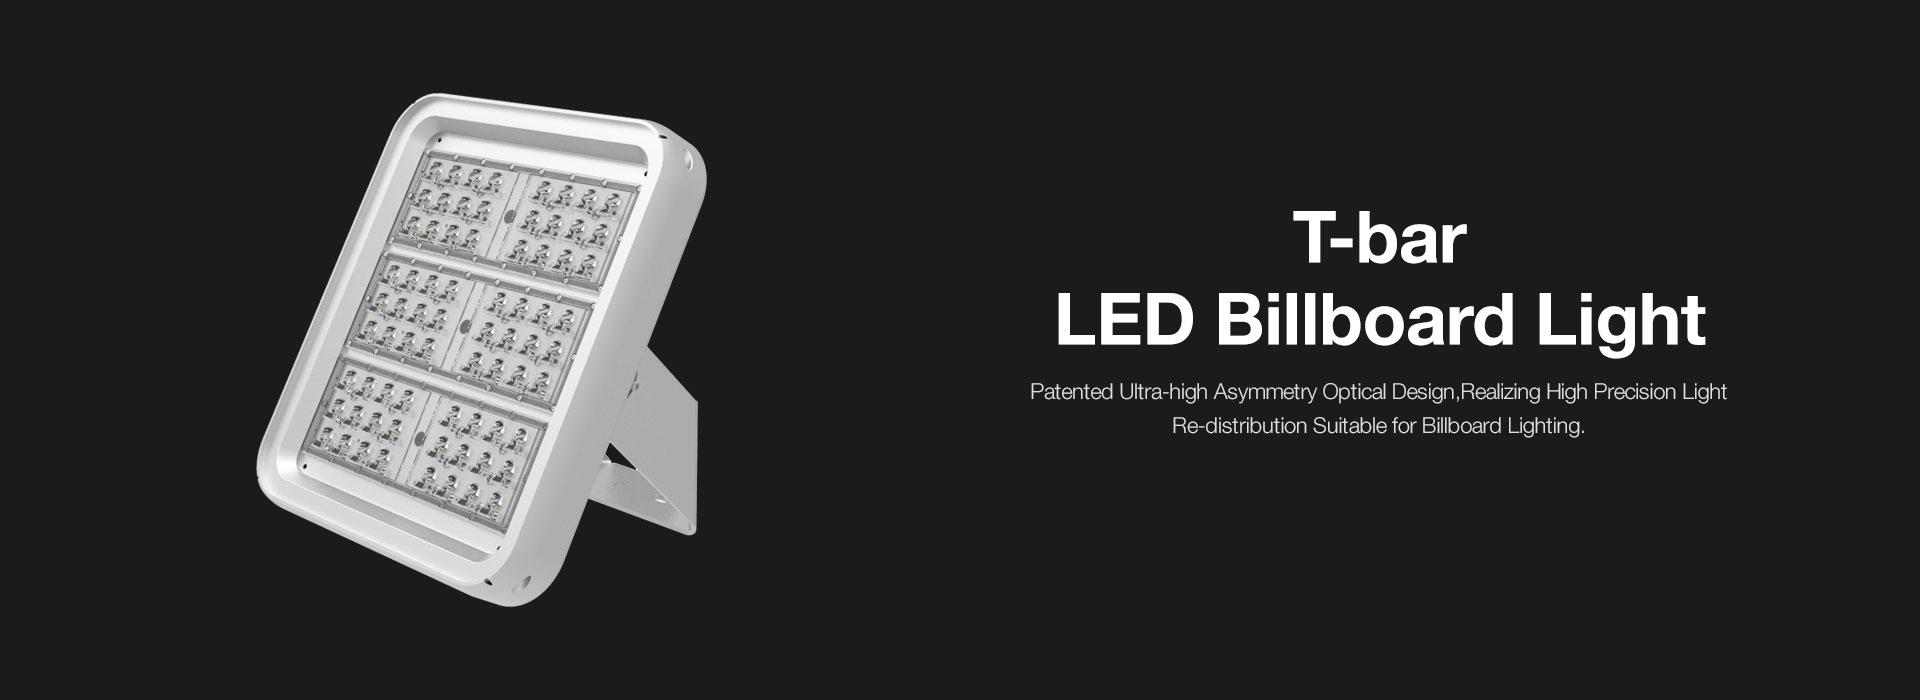 & T-bar LED billboard light - Landscape lighting - YAHAM Lighting